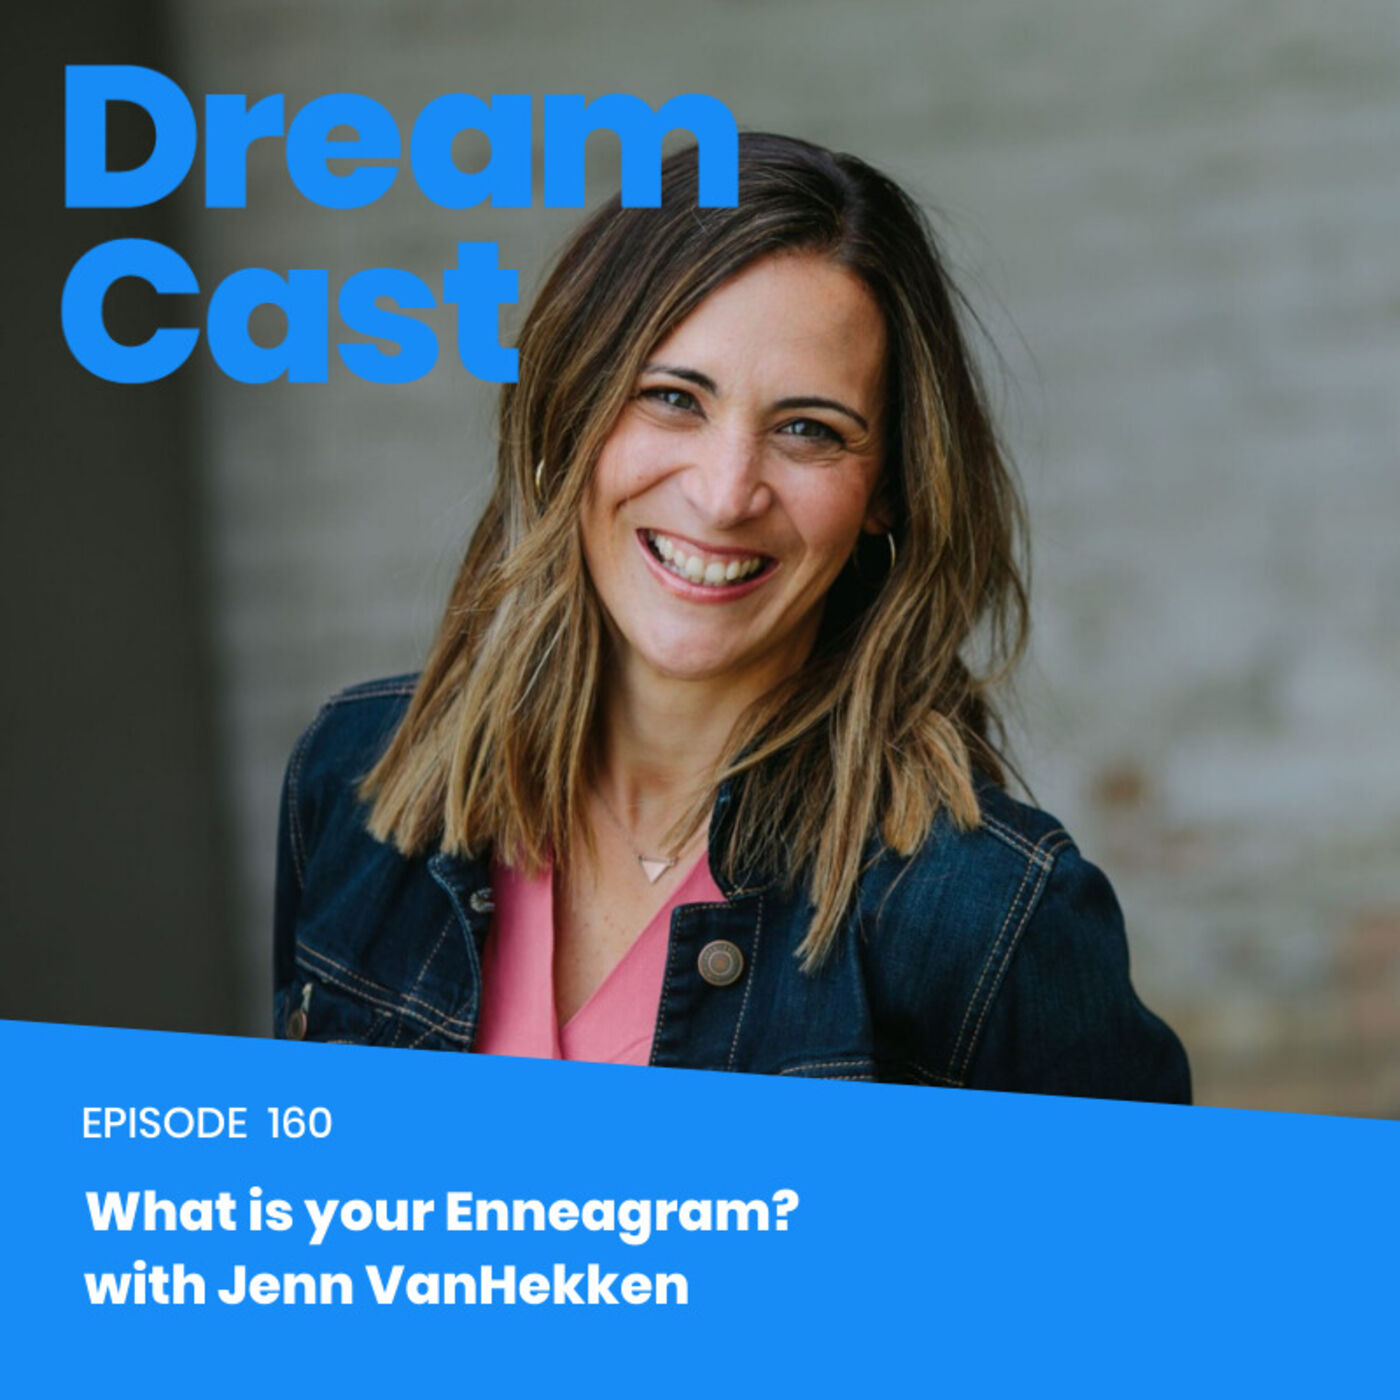 Episode 160 – What is your Enneagram? with Jenn VanHekken